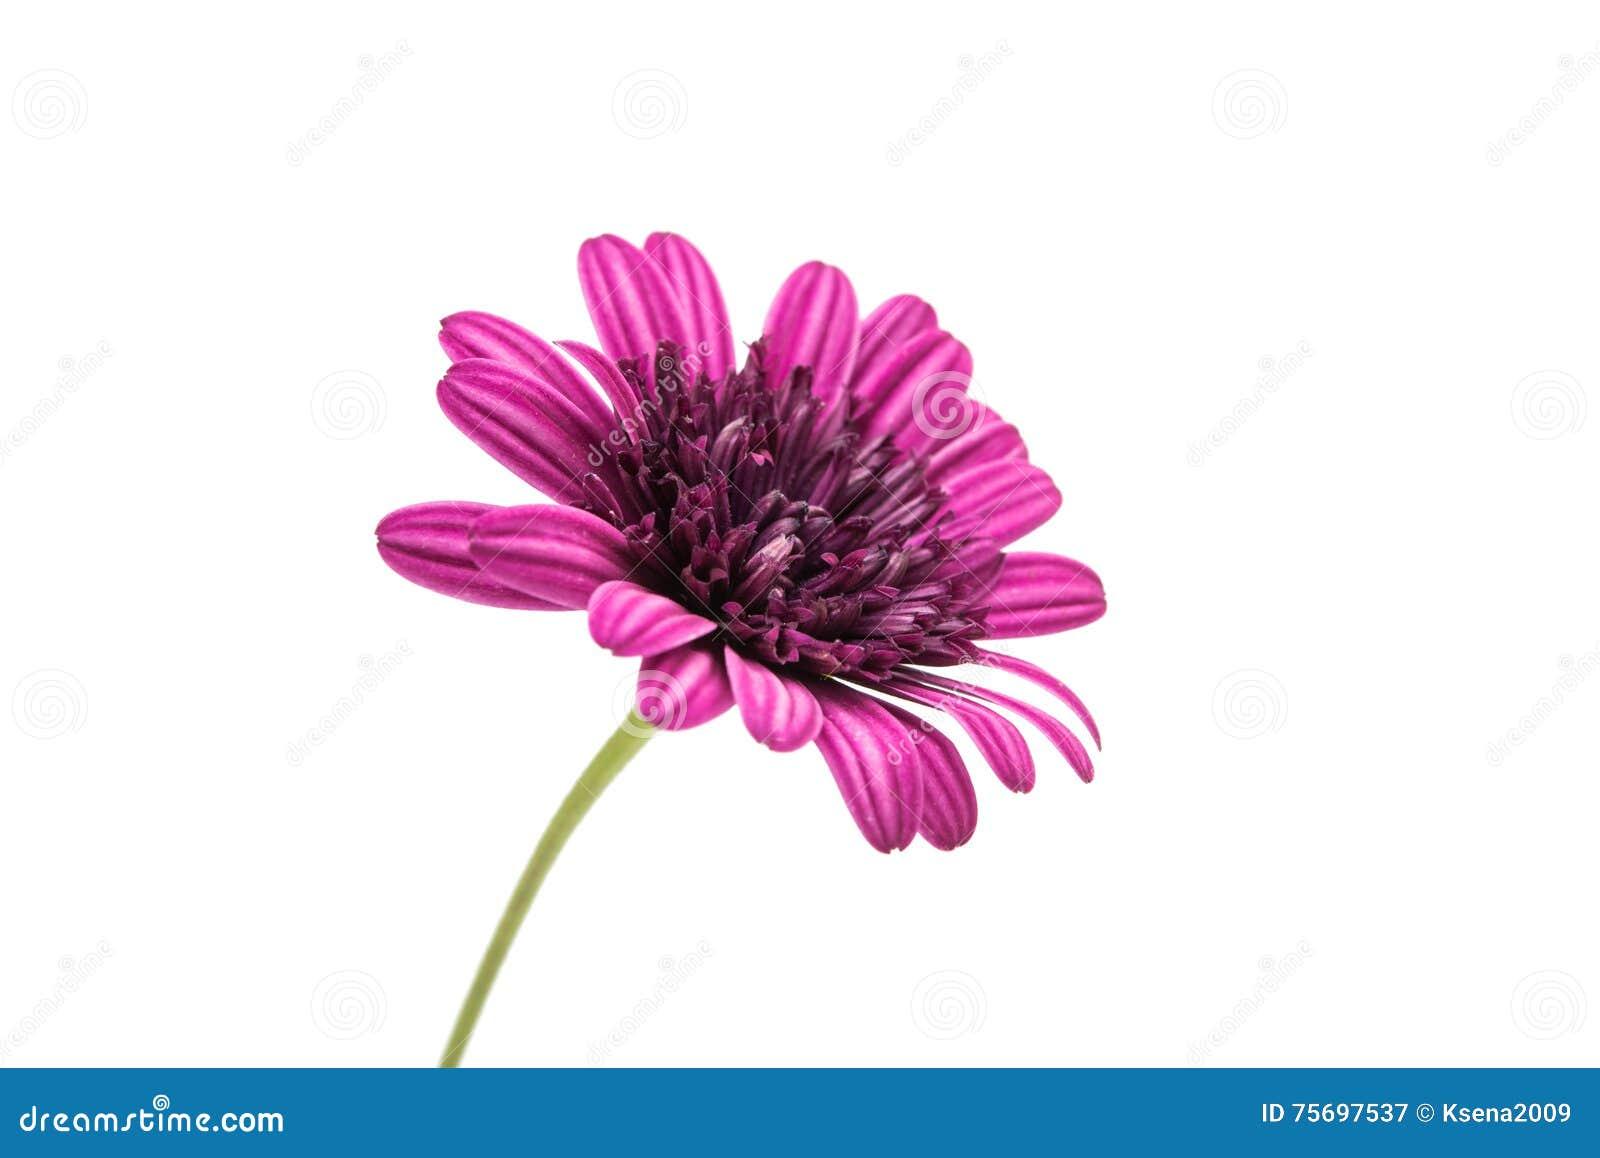 Purple chrysanthemum flower daisy family stock image image of purple chrysanthemum flower daisy family isolated on white background izmirmasajfo